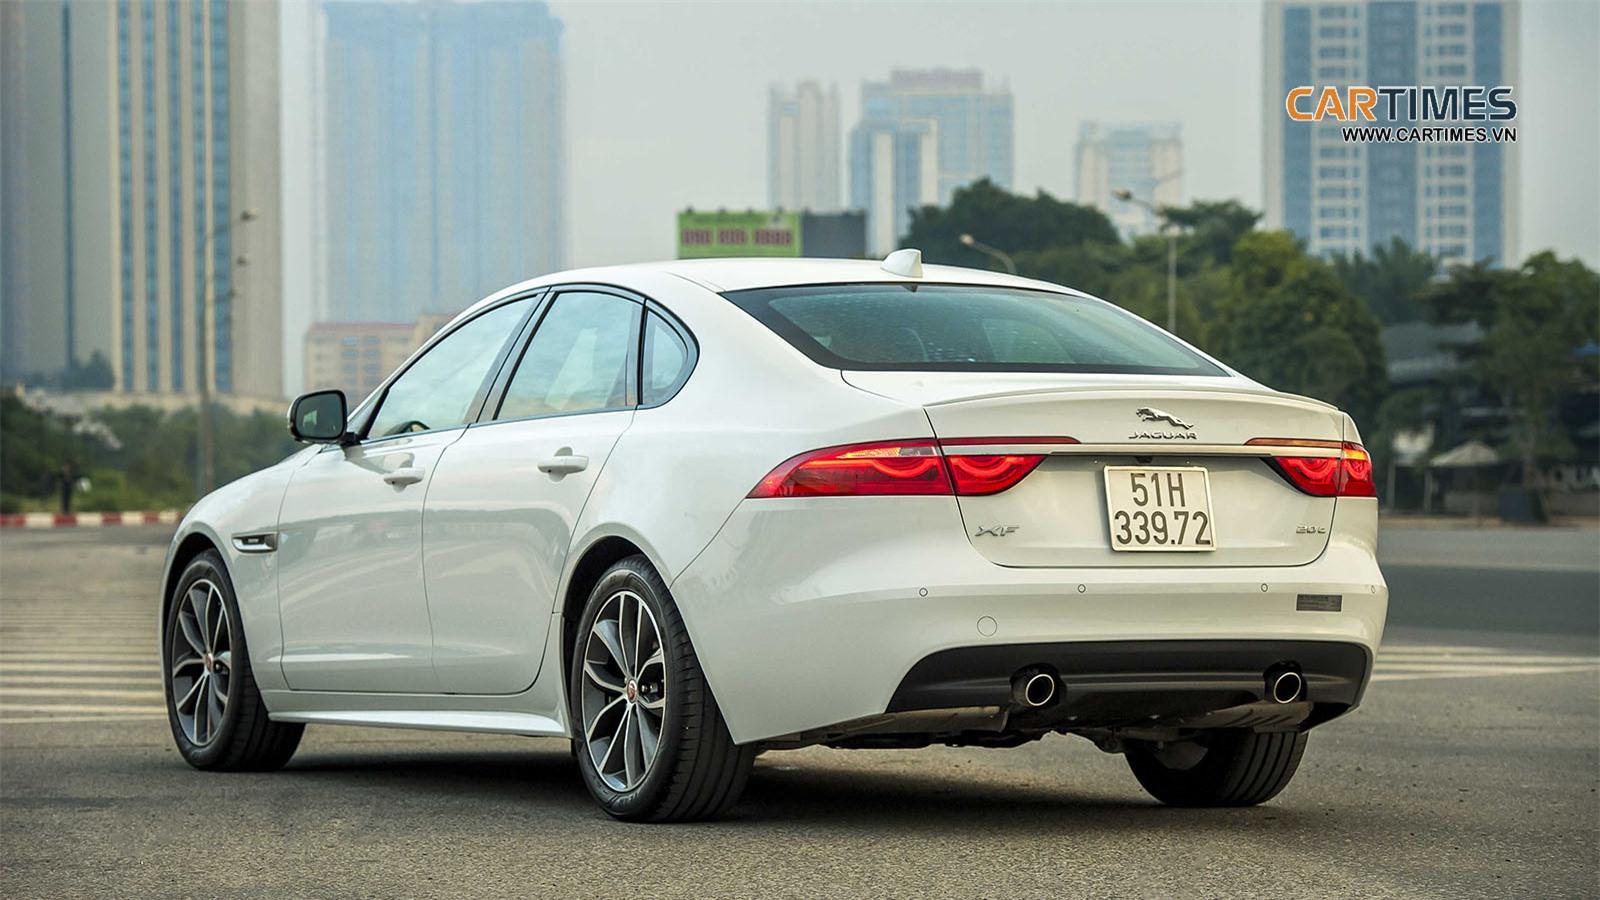 Giá bán xe Jaguar XF R-Sport